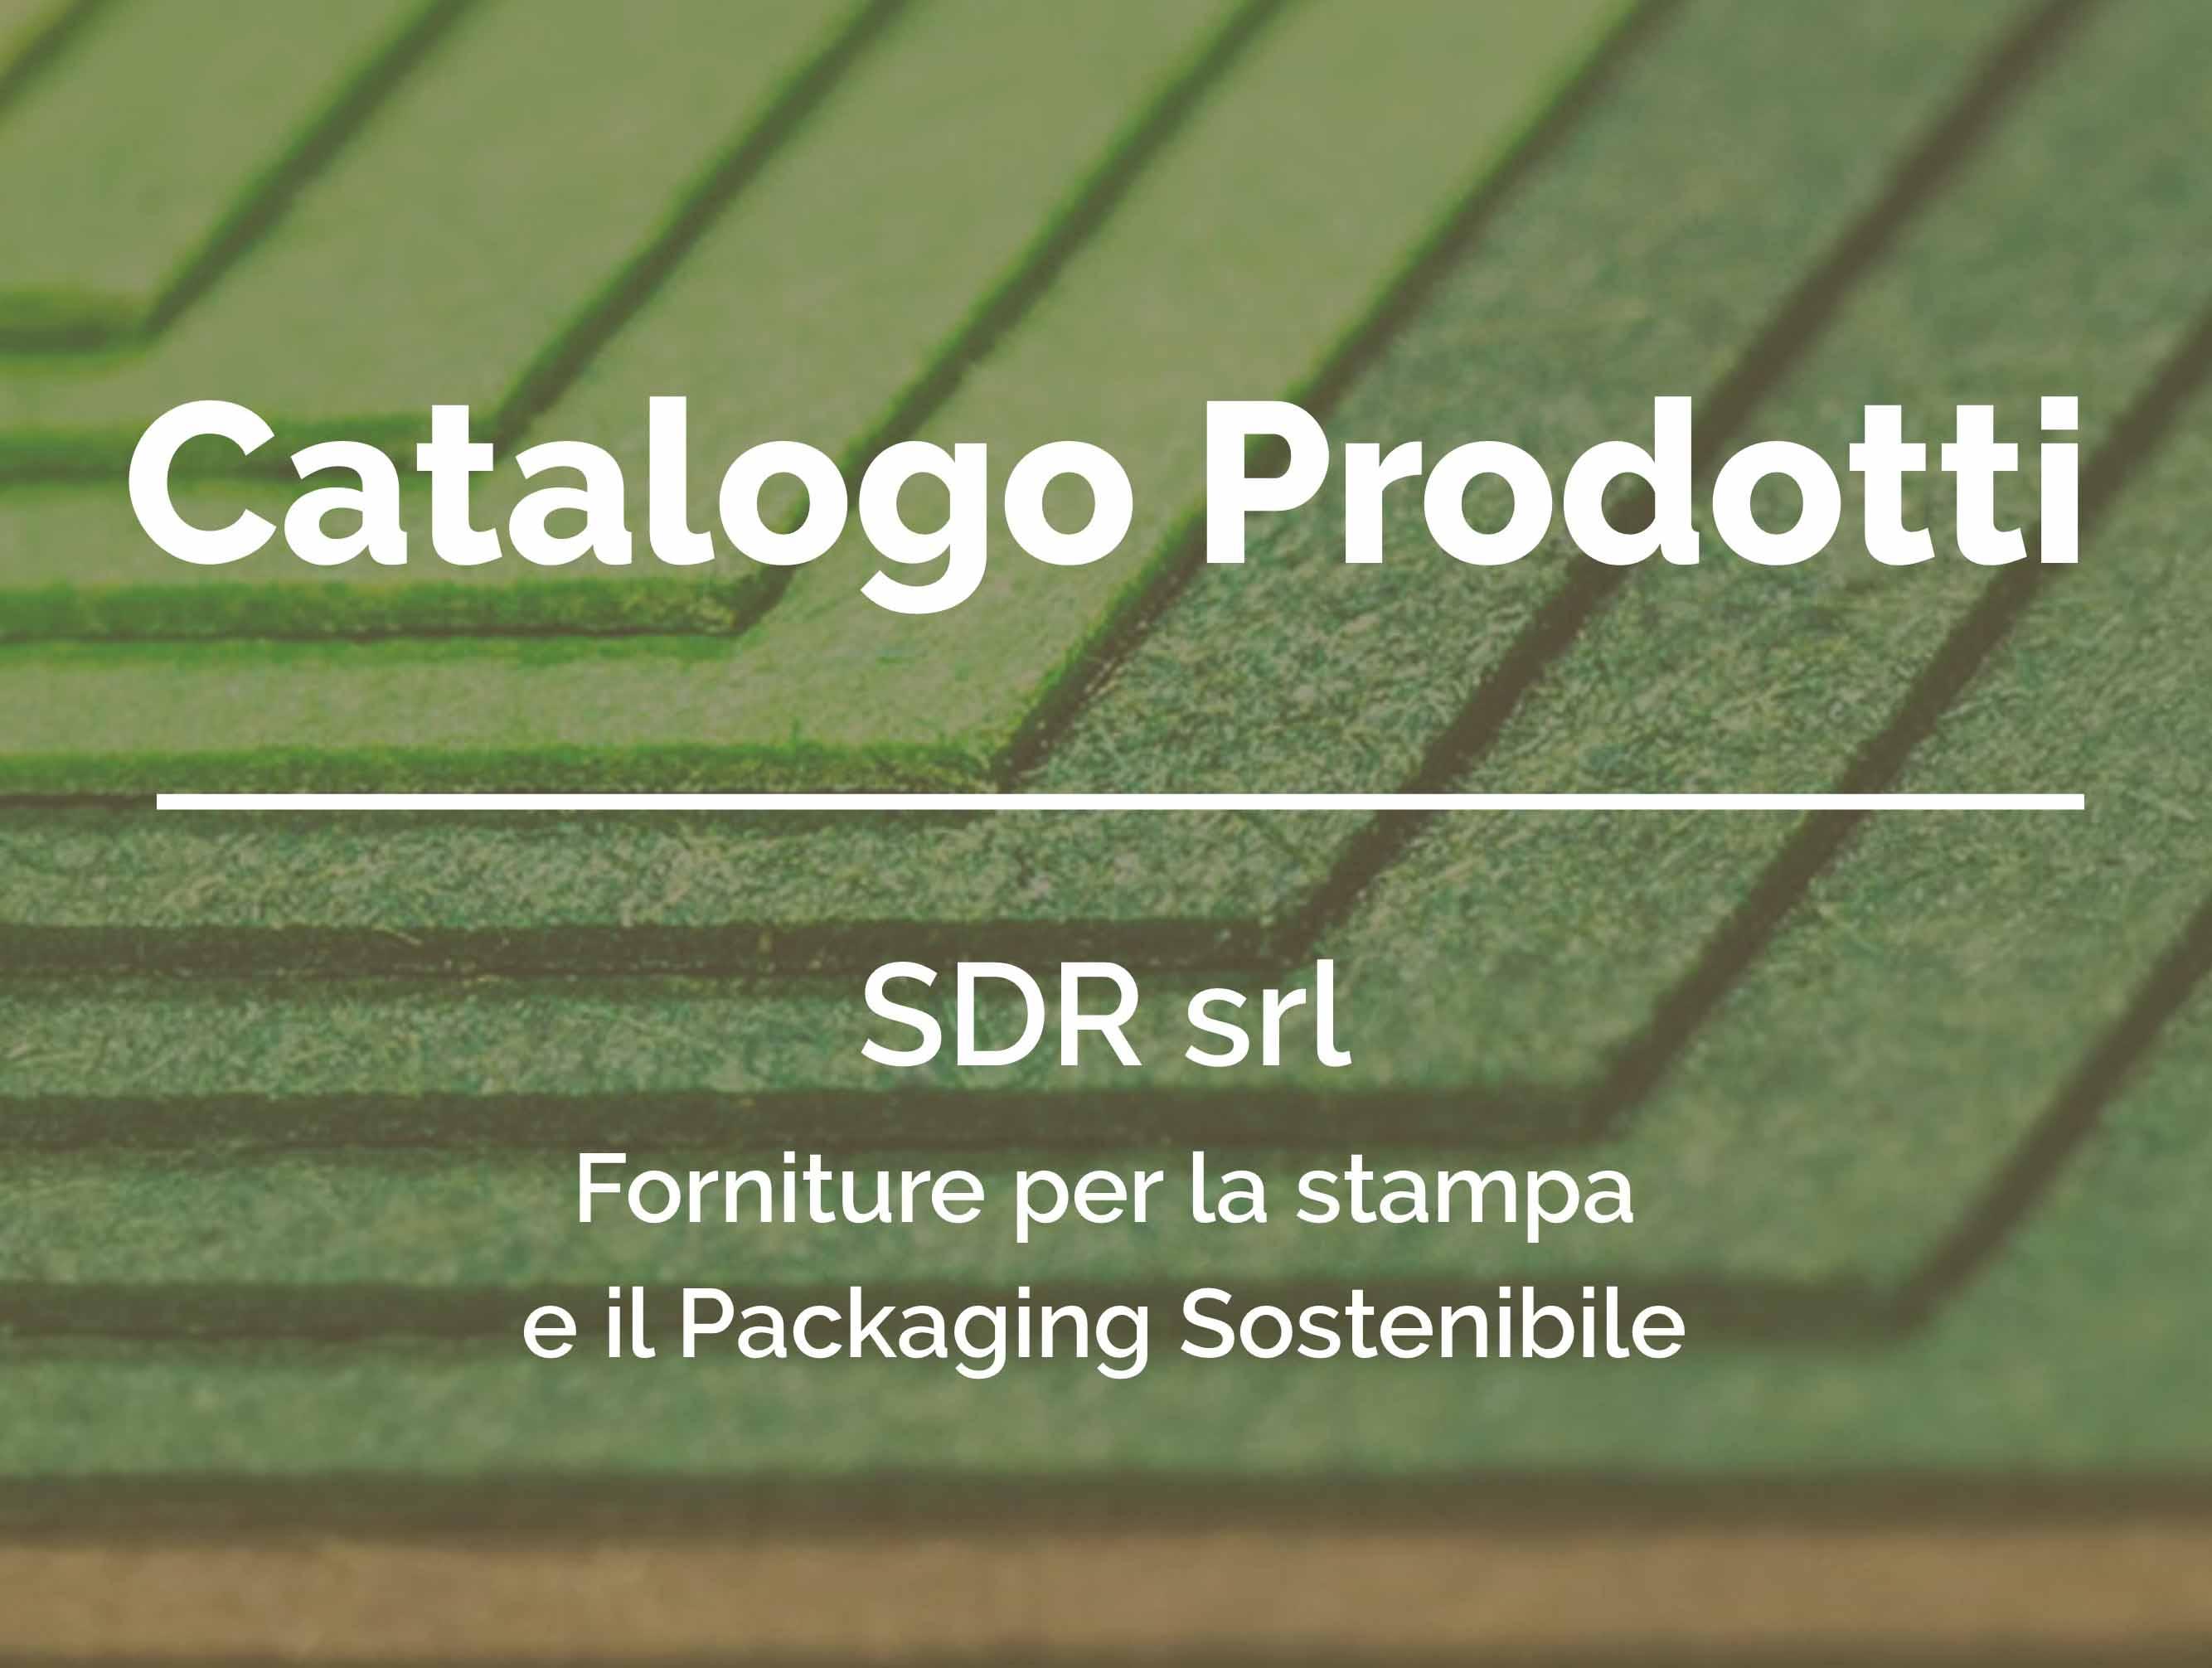 catalogo prodotti SDR srl